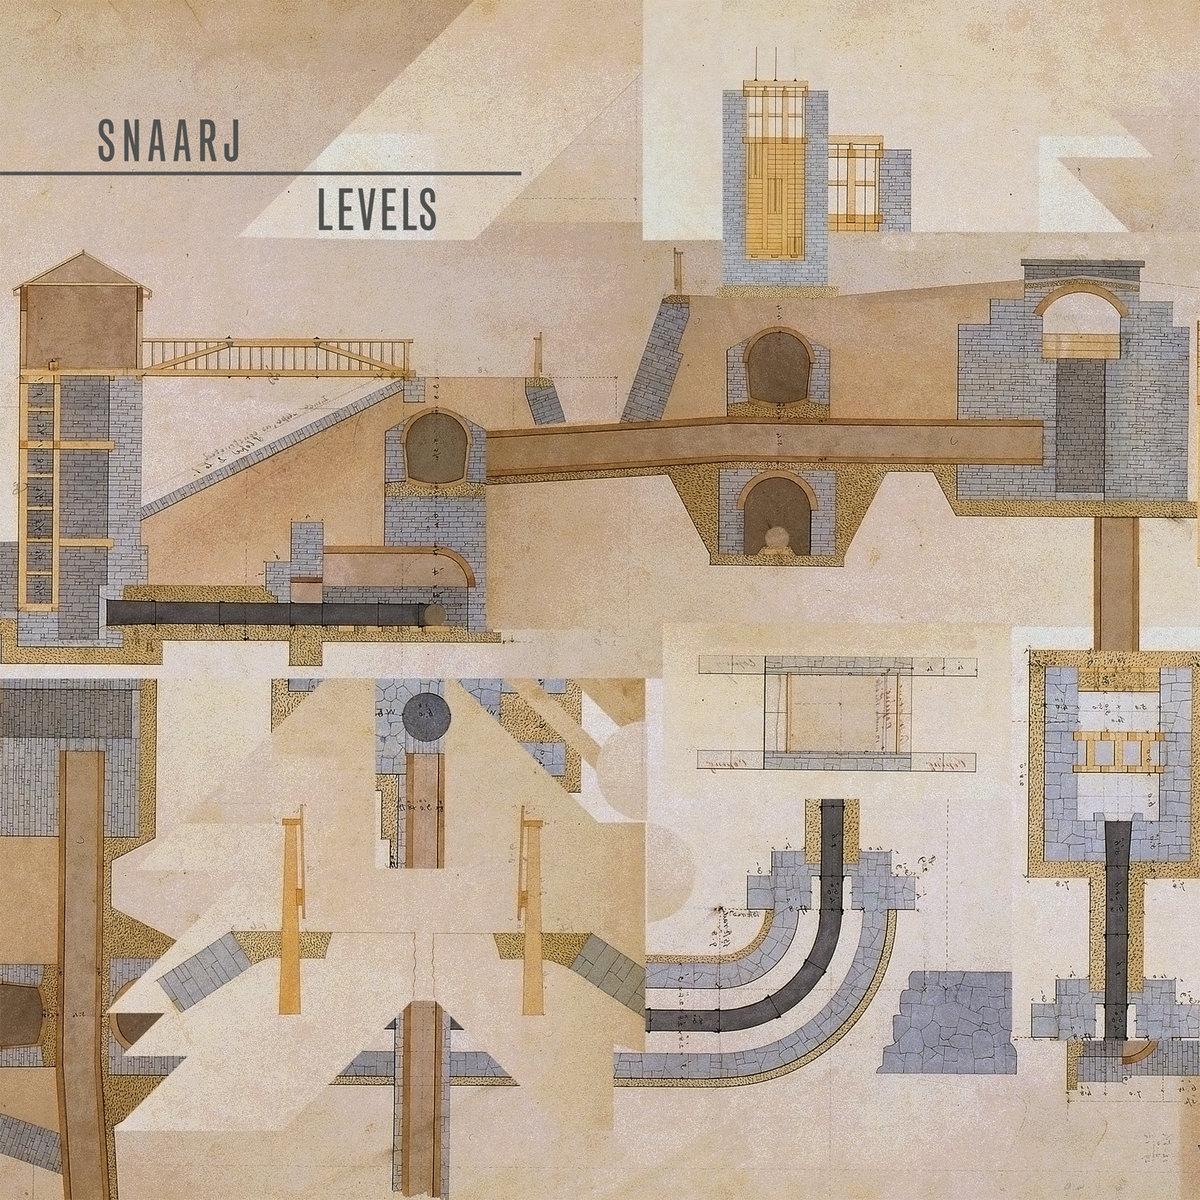 Snaarj - Levels (2012)